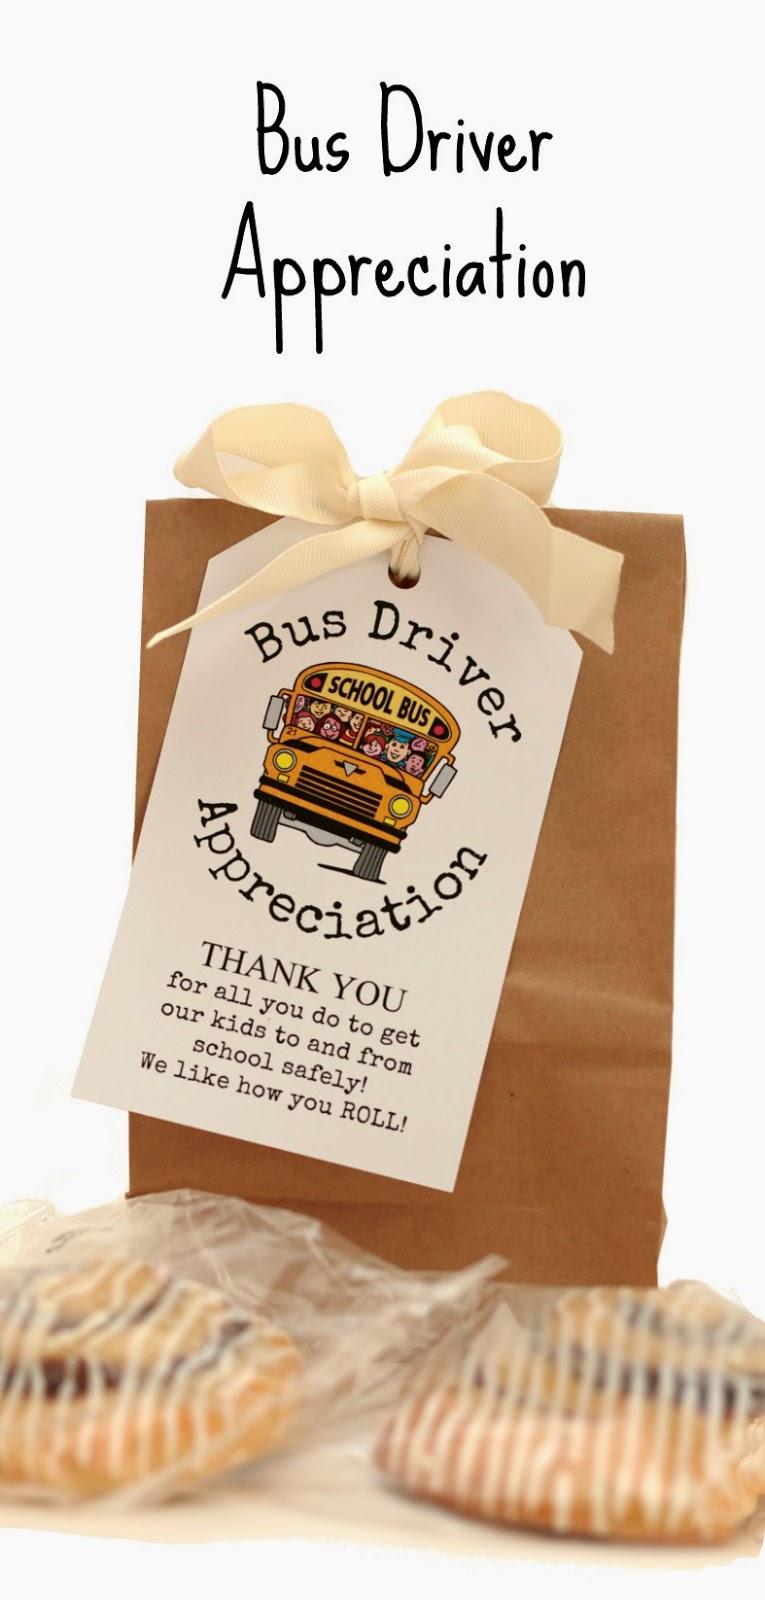 http://keepingmycents.blogspot.ca/2015/03/bus-driver-appreciation.html?m=1